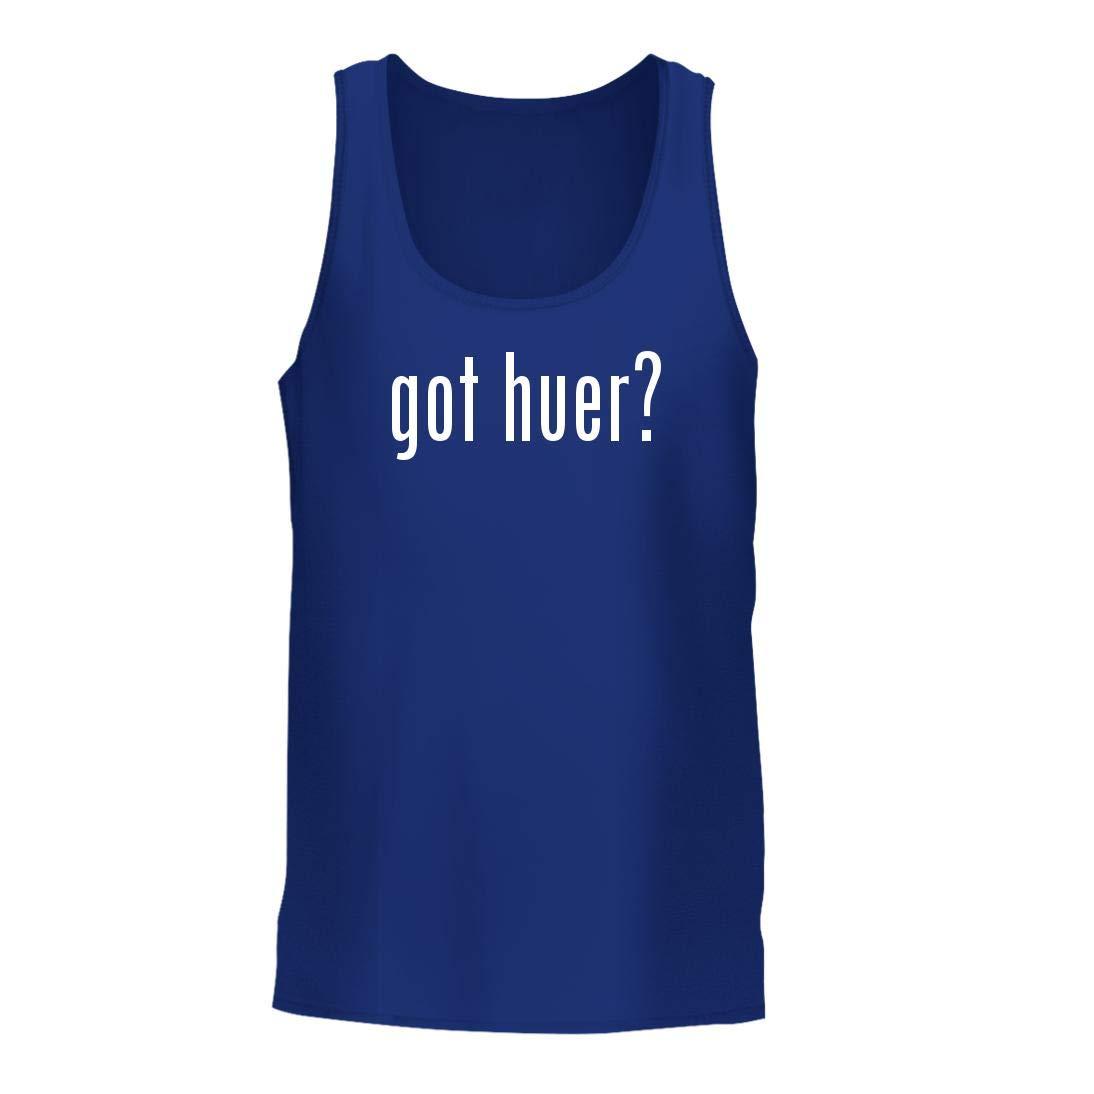 got Huer? - A Nice Men's Tank Top, Blue, Large